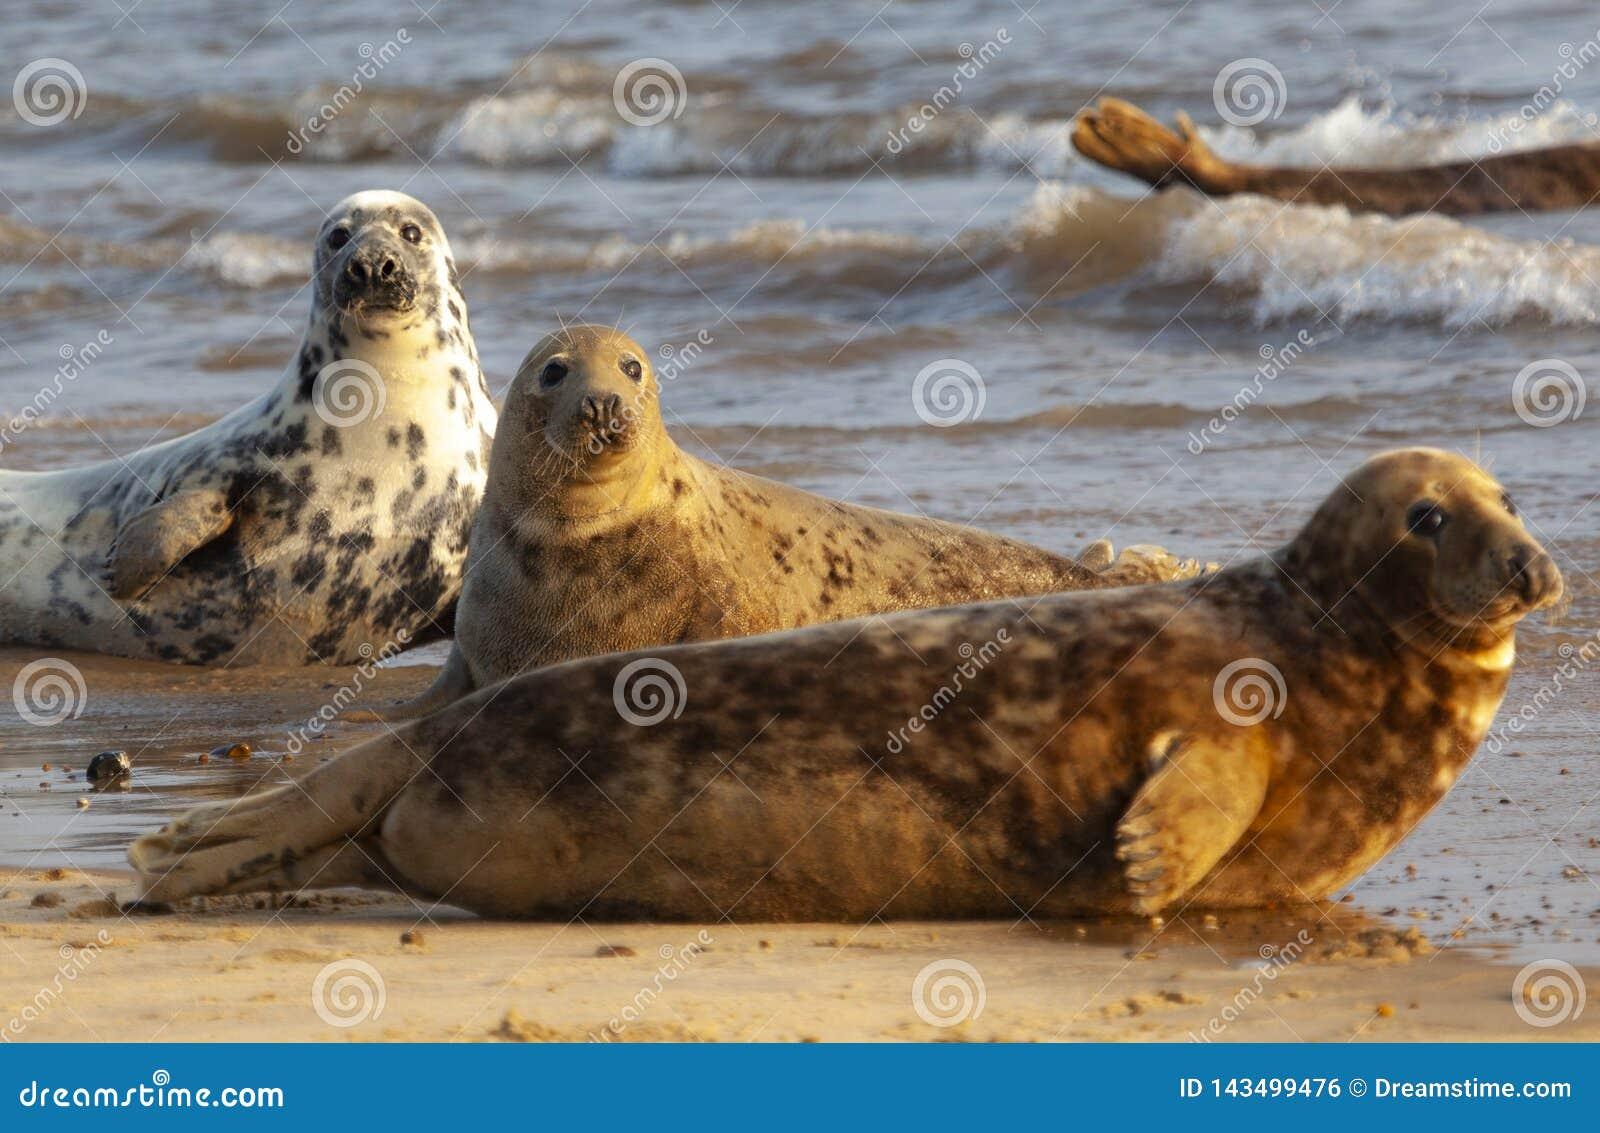 Atlantic grey seal on the beach